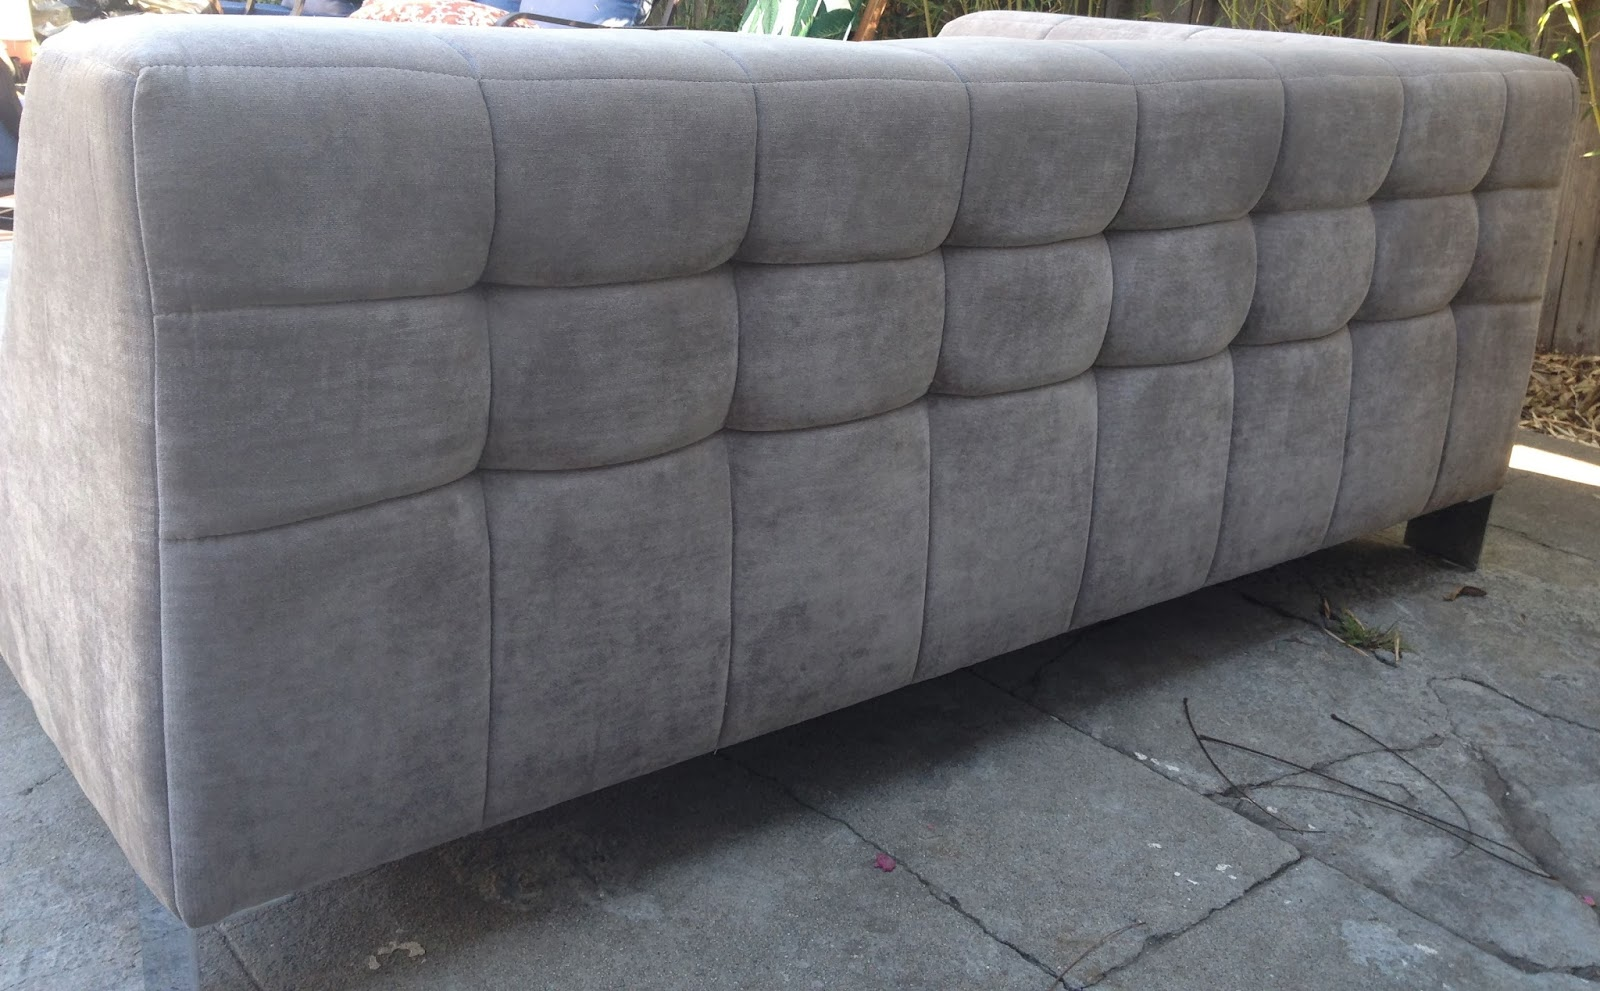 rosa beltran design amazing ligne roset style tufted chaise sofas for sale. Black Bedroom Furniture Sets. Home Design Ideas